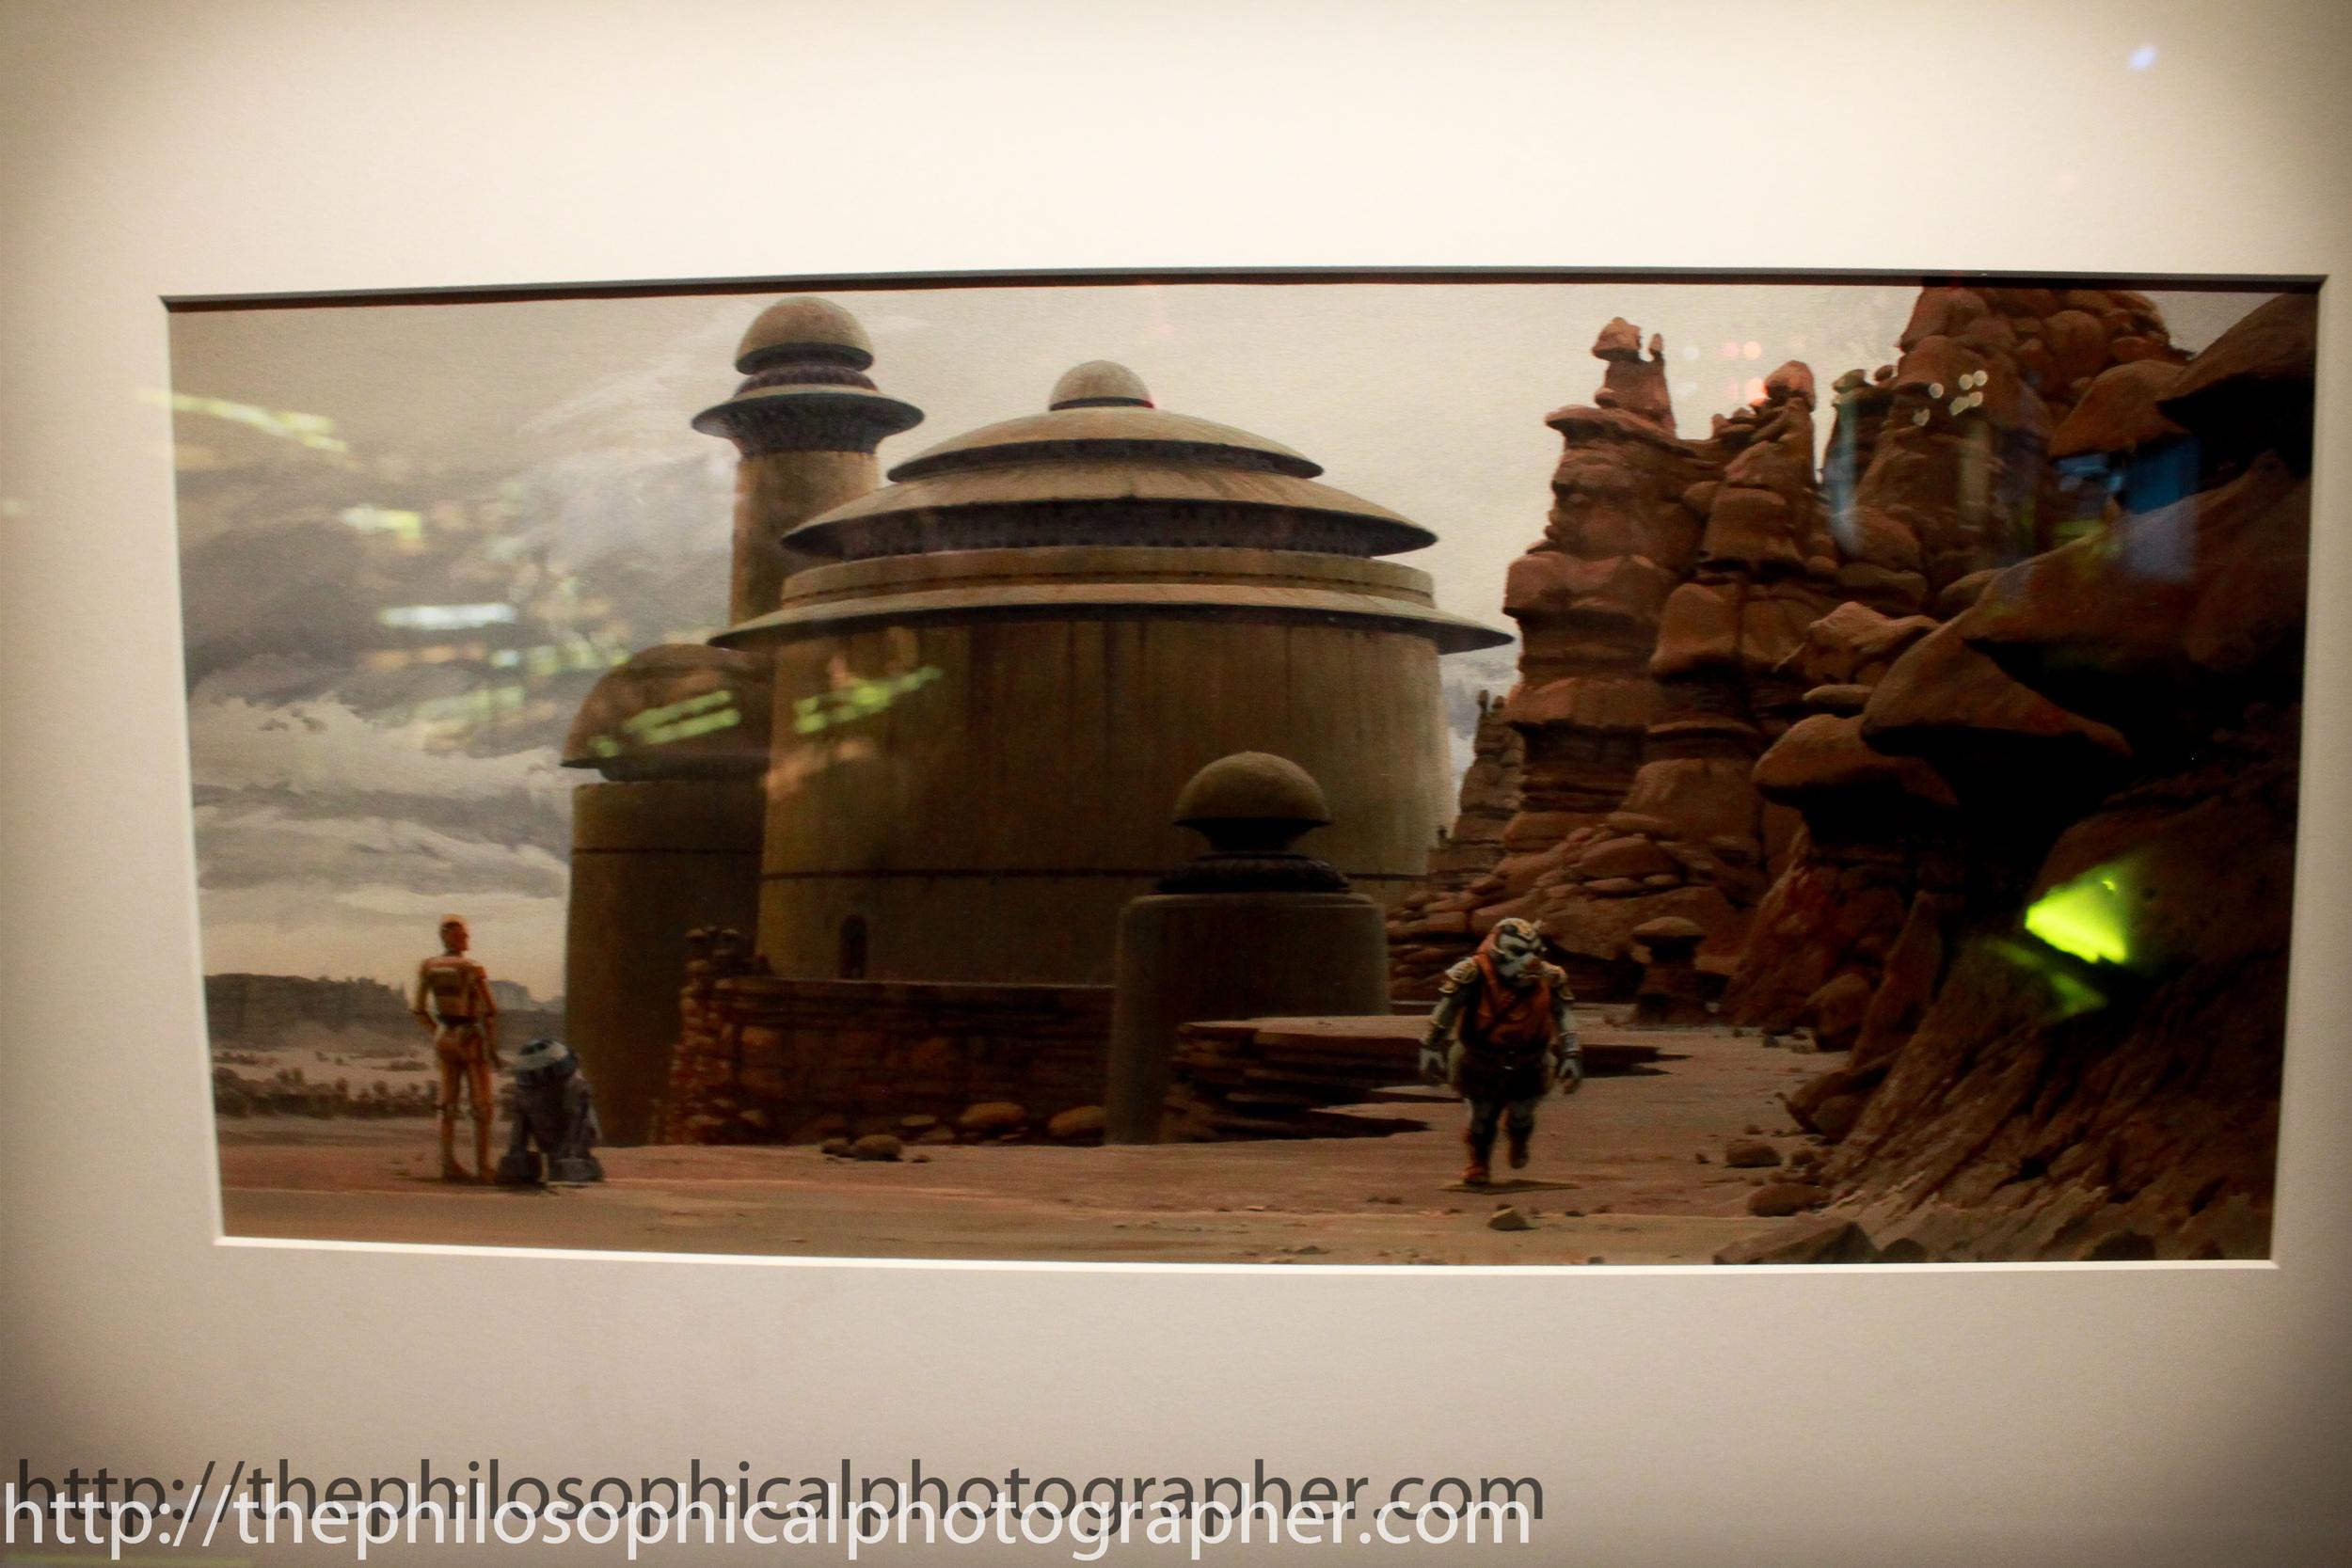 Droids at Jabba's Palace